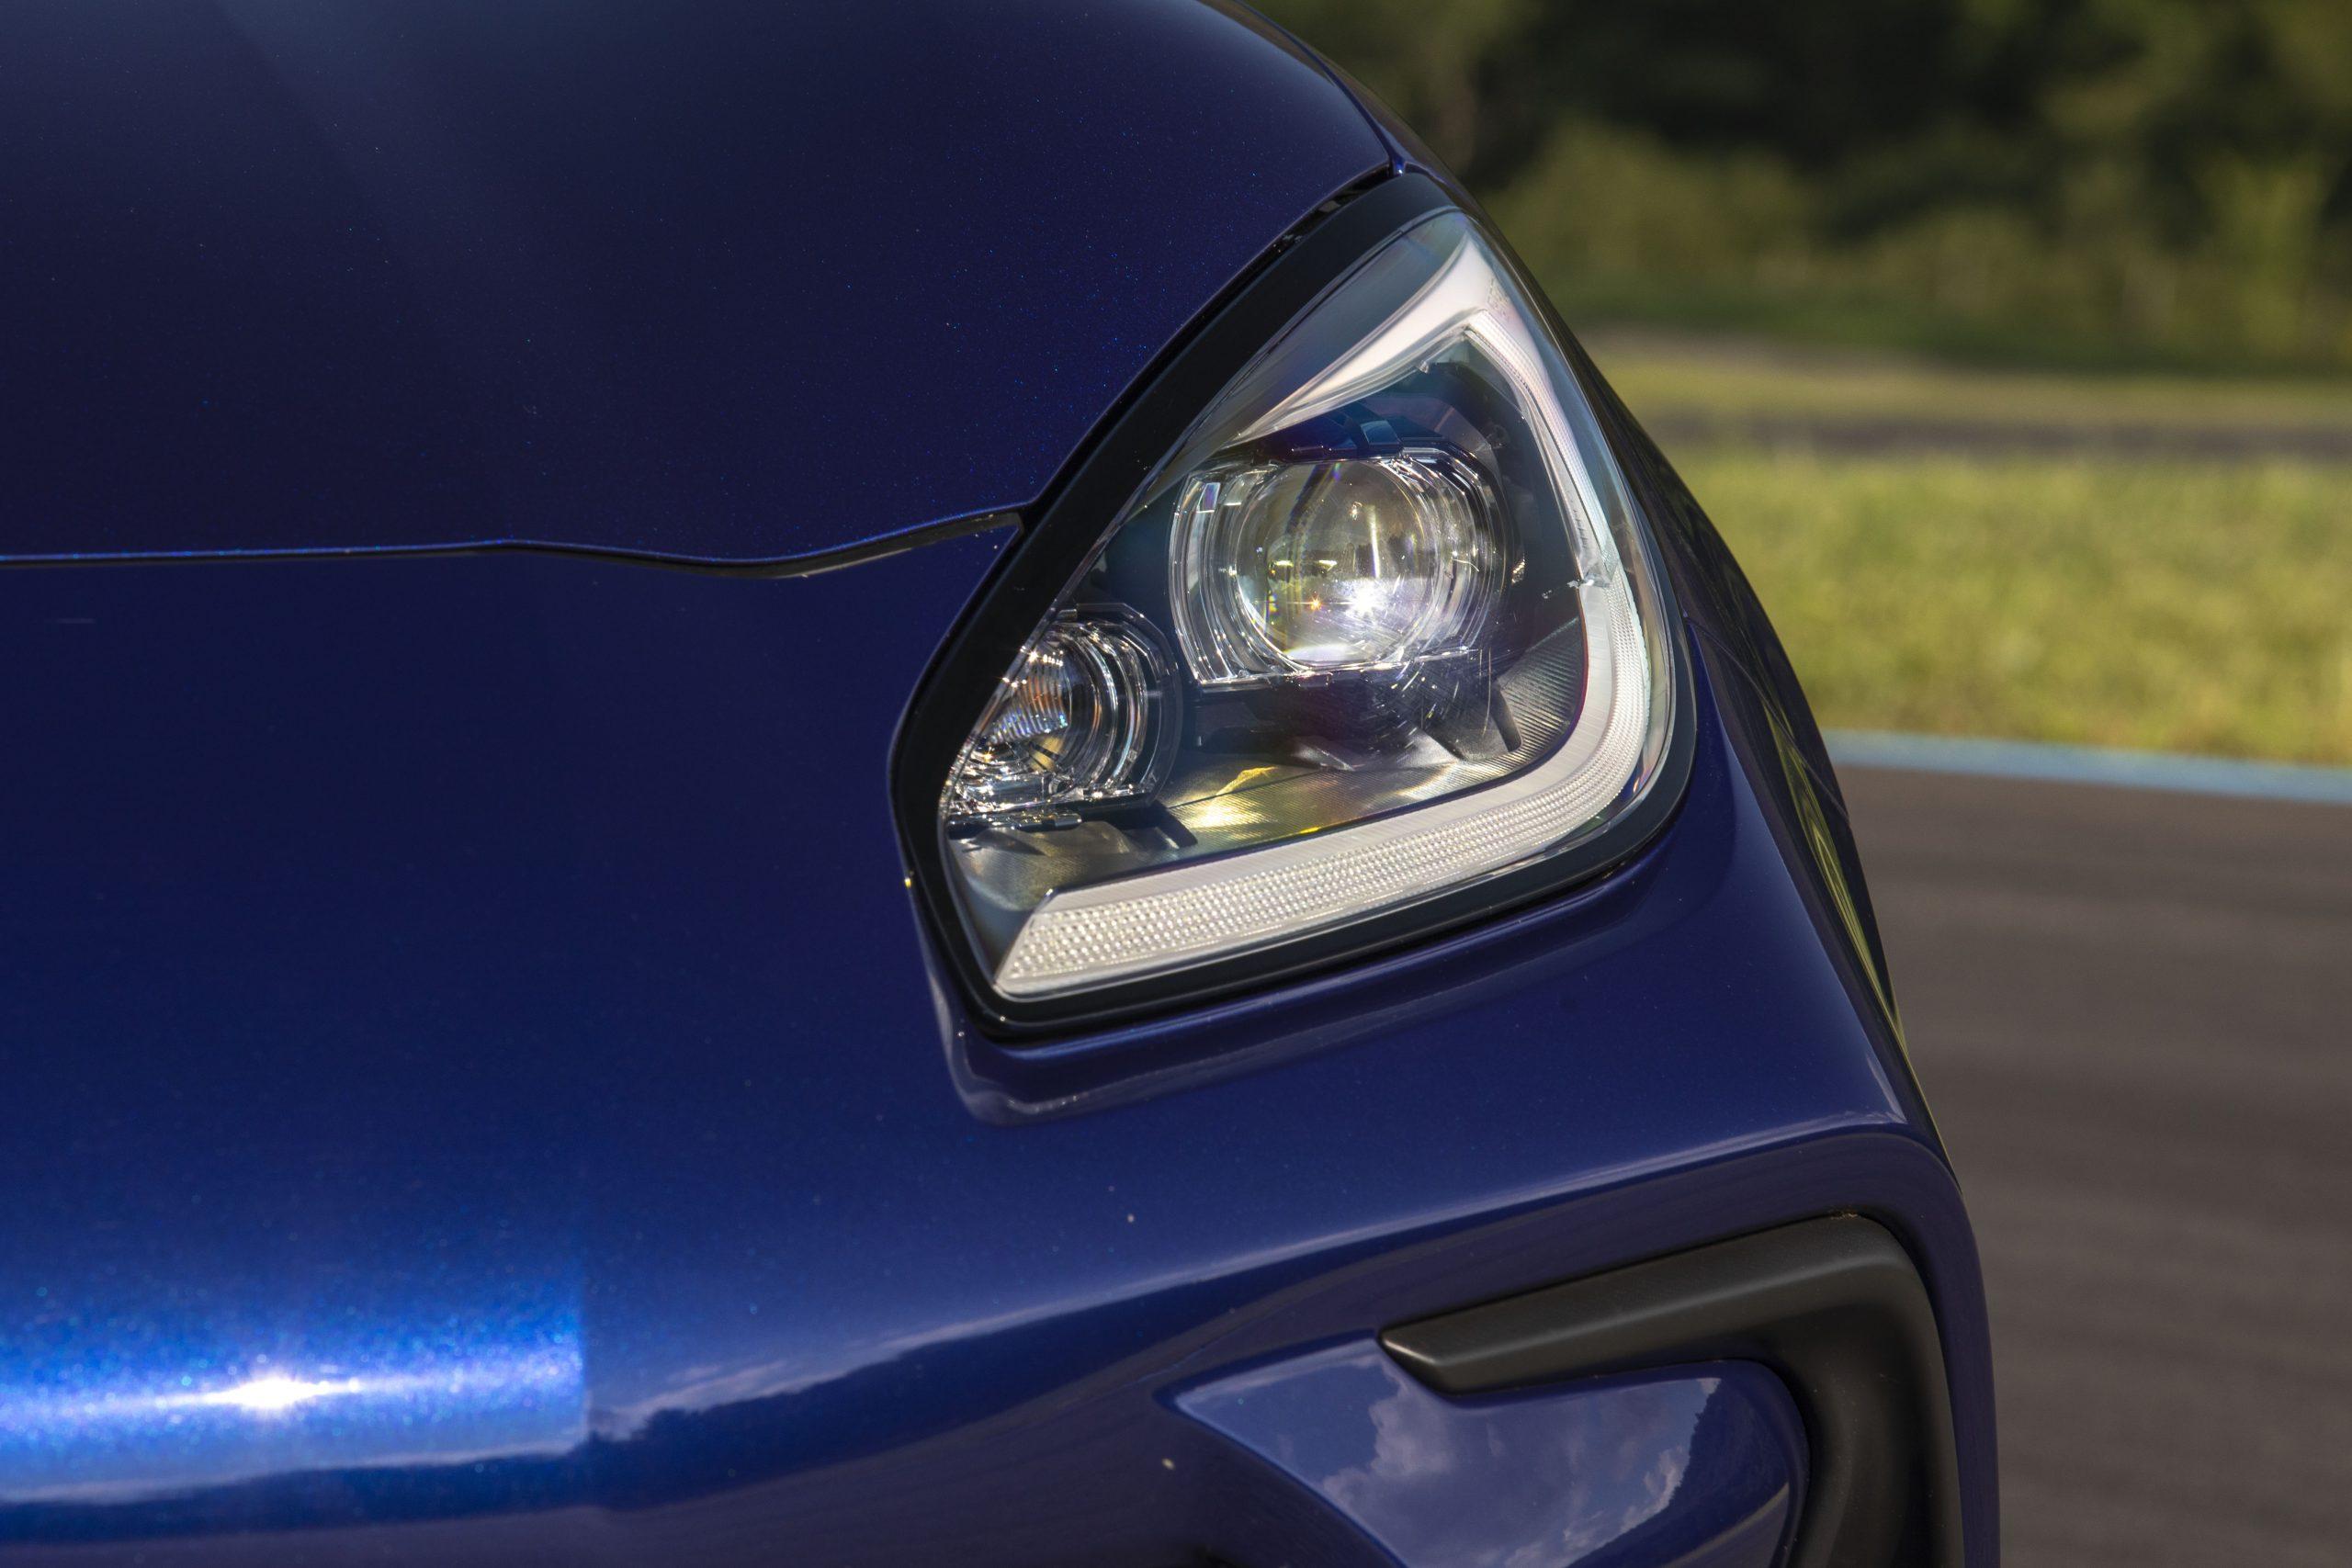 2022 Subaru BRZ headlight close